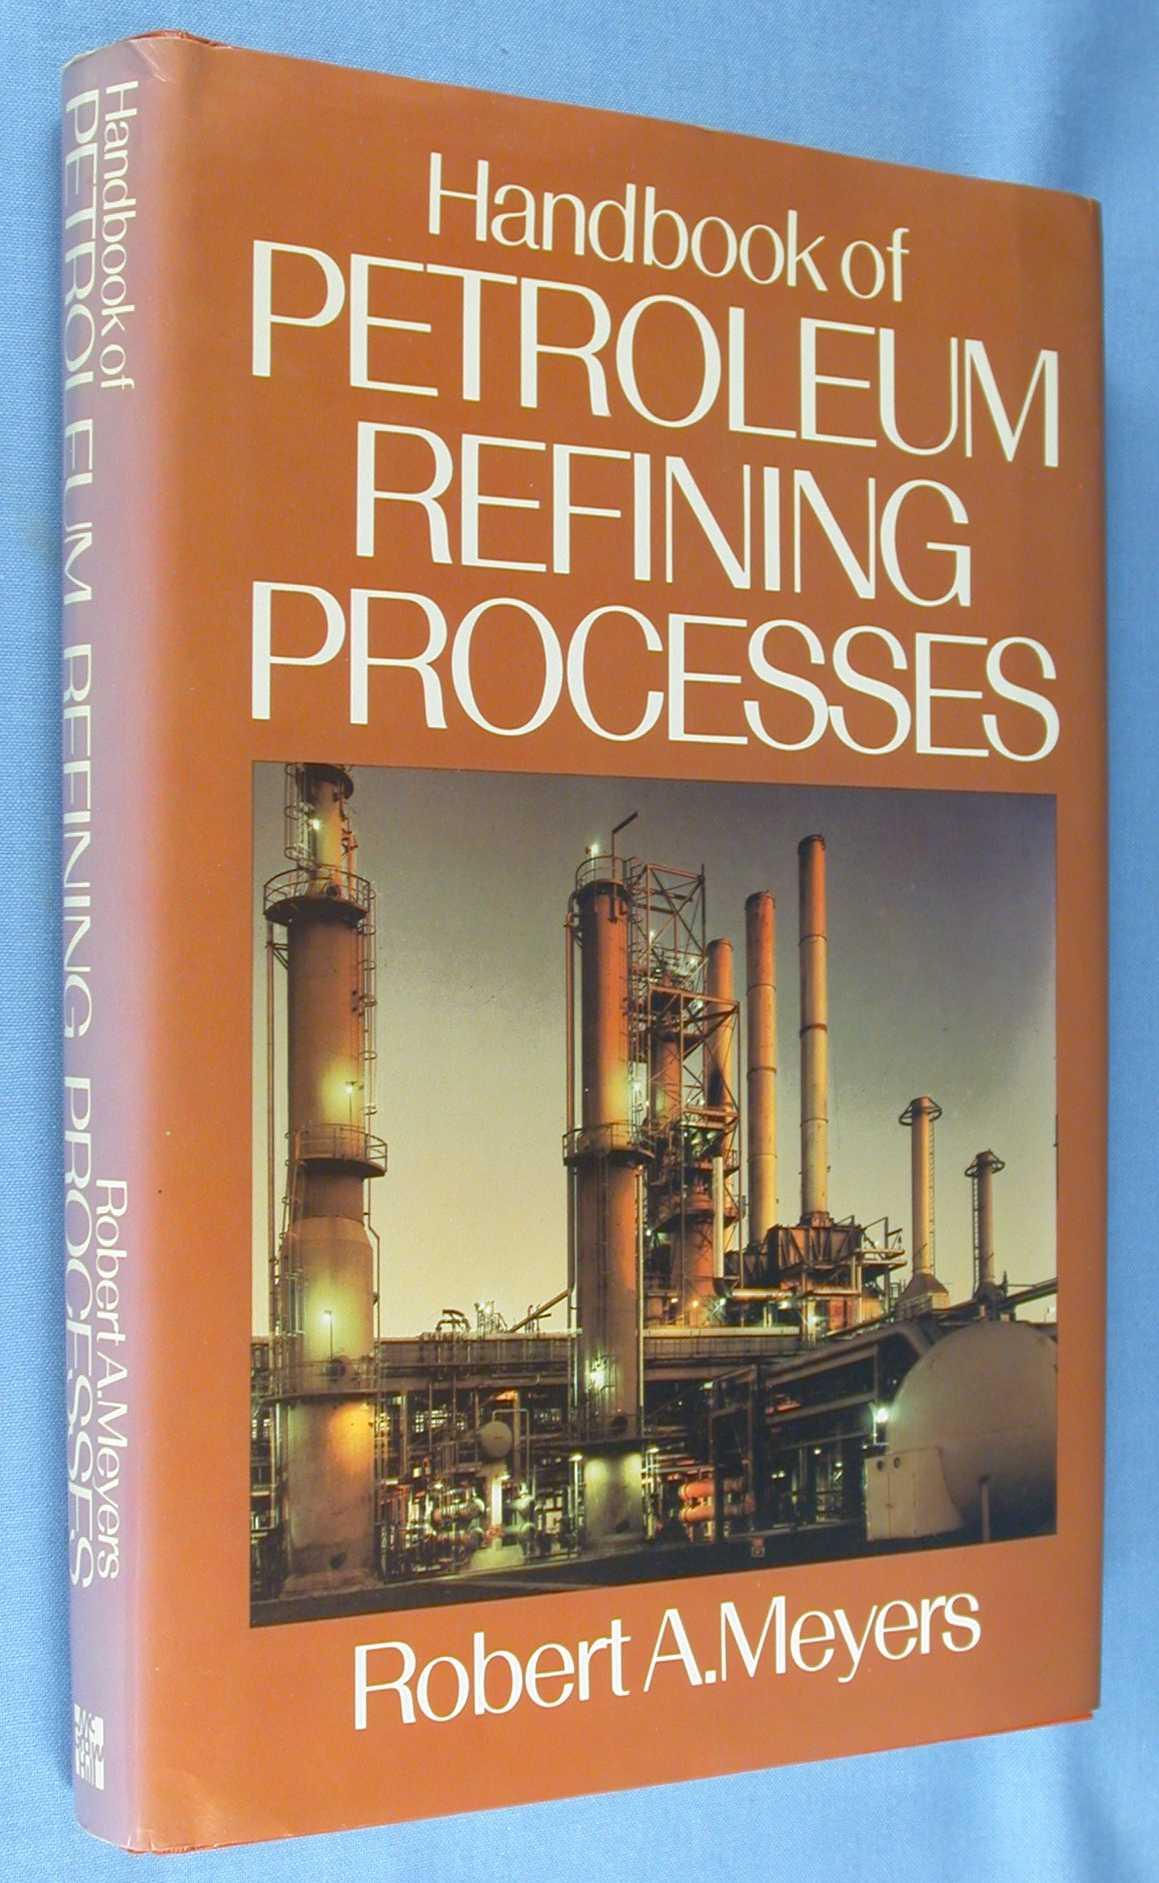 Handbook of Petroleum Refining Processes, Meyers, Robert A. (editor)